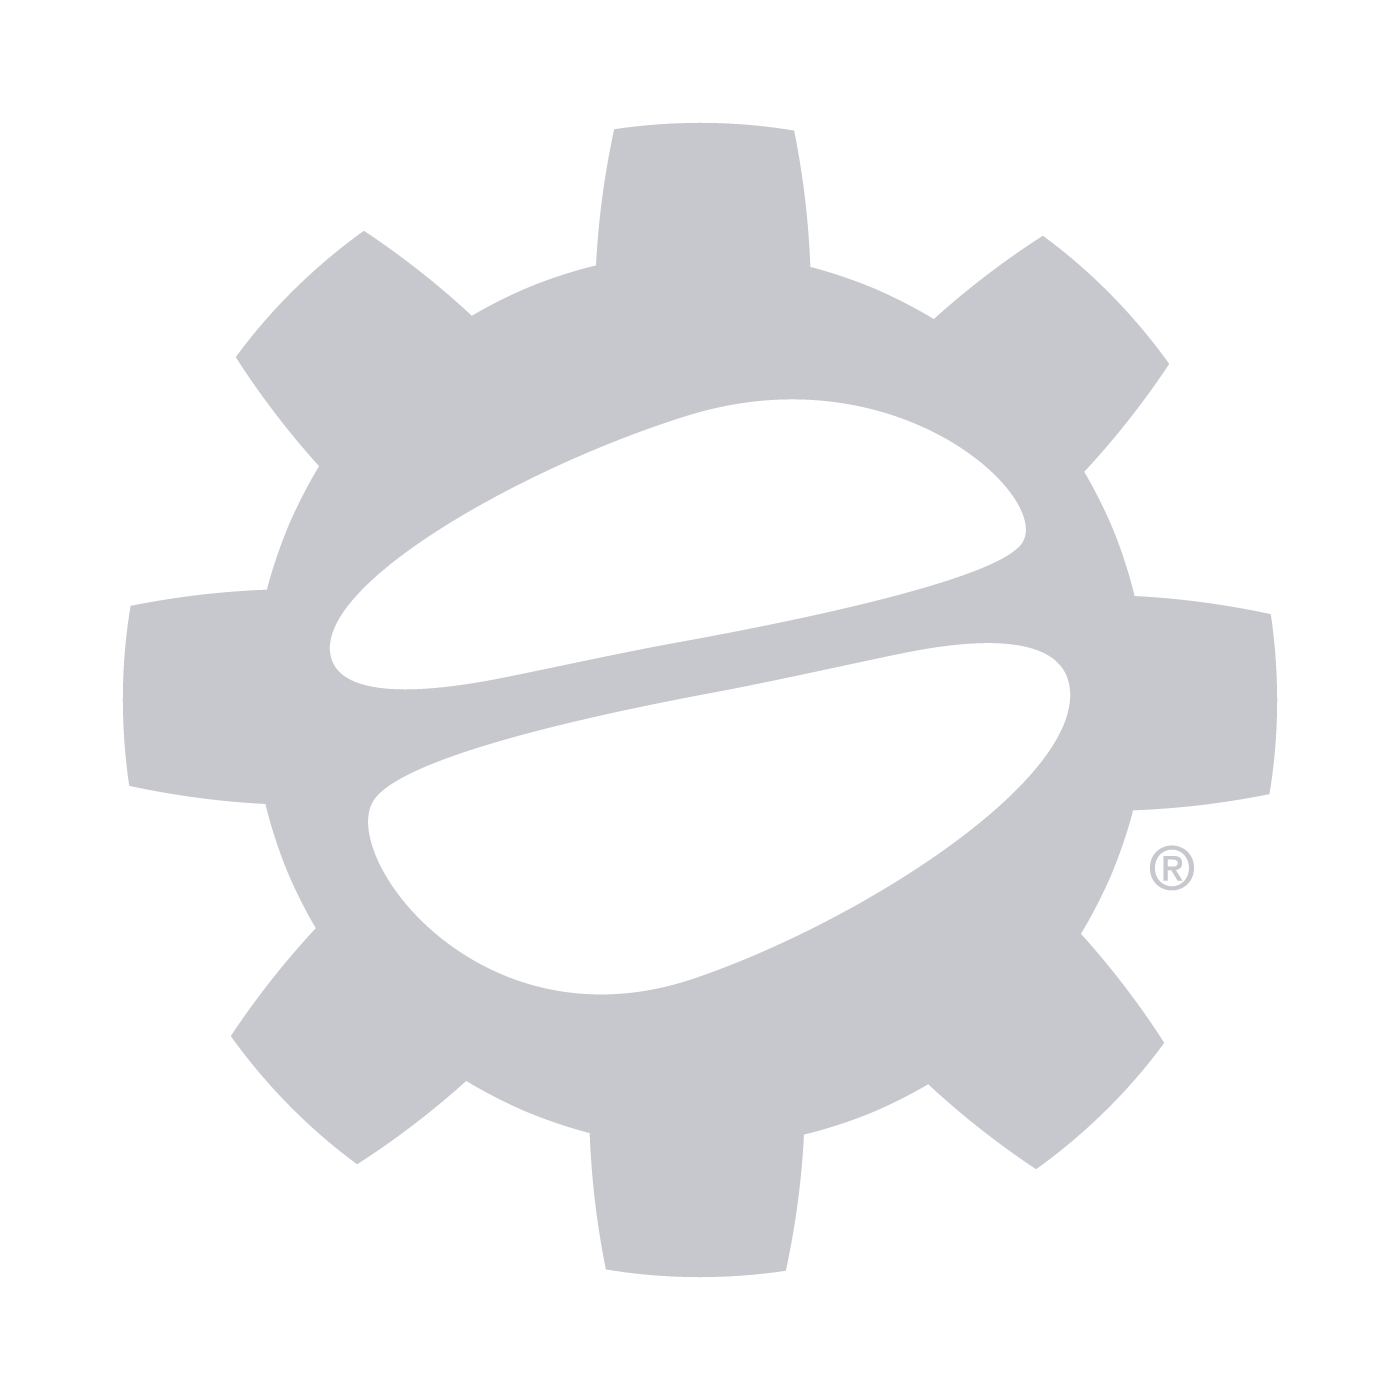 Saeco Xelsis SM7685 Superautomatic Espresso Machine - Stainless Steel